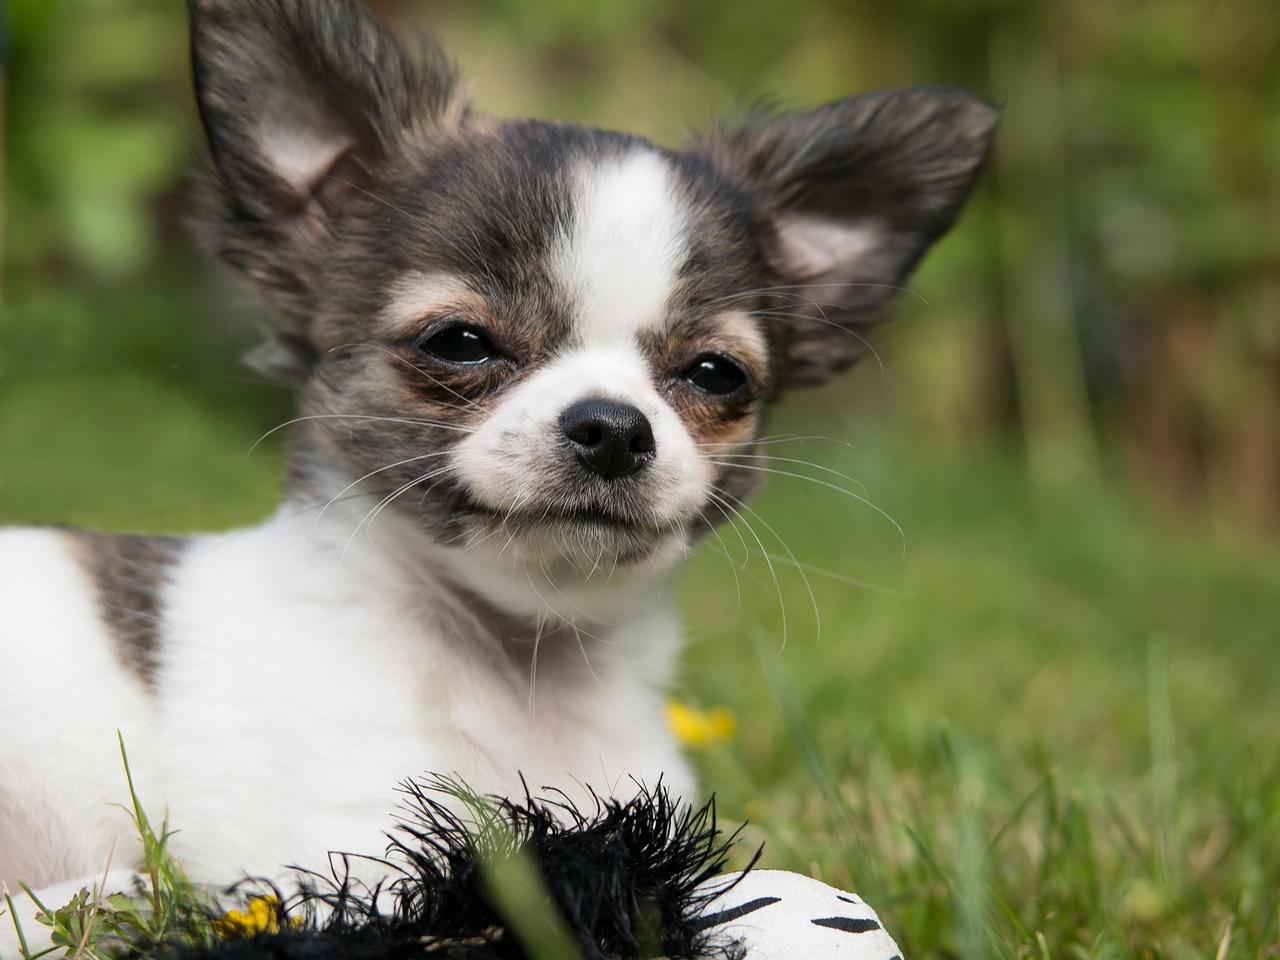 Shampoodles Grooming Coconut Creek Shampoodles Pet Grooming Coconut Creek Fl Chihuahua Puppies